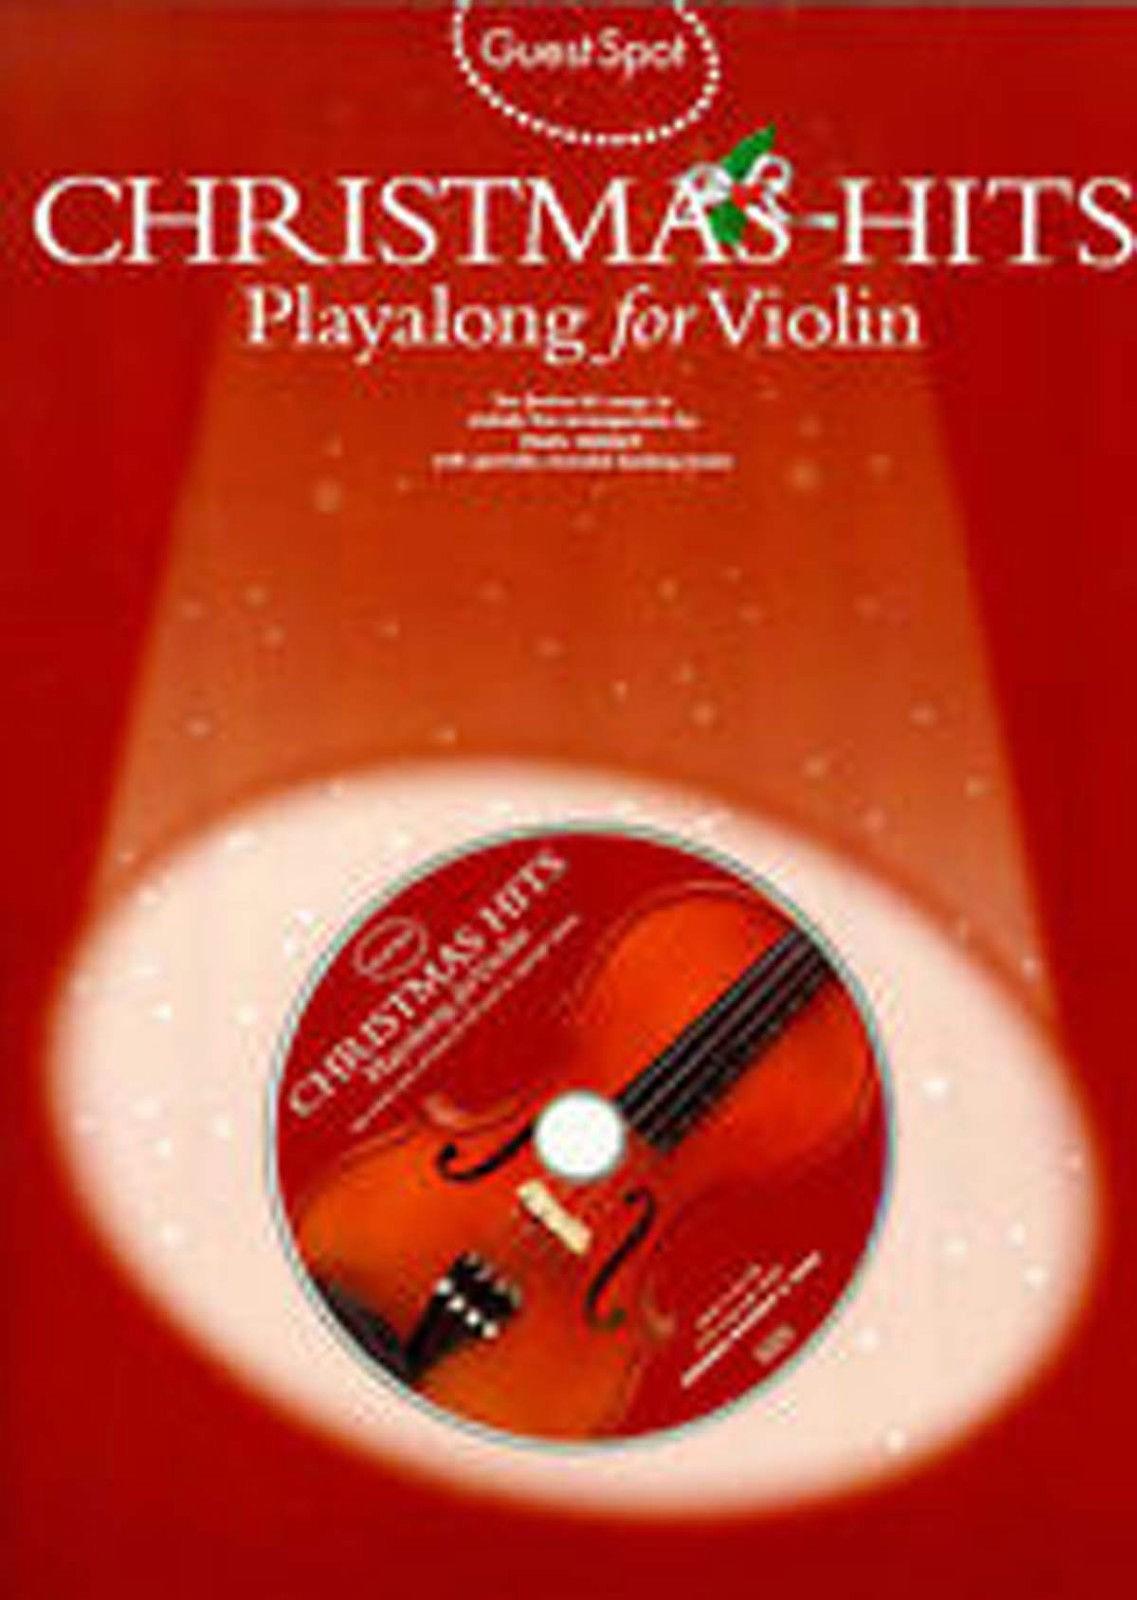 Guest Spot Christmas Hits Playalong Violin Book CD Festive B73